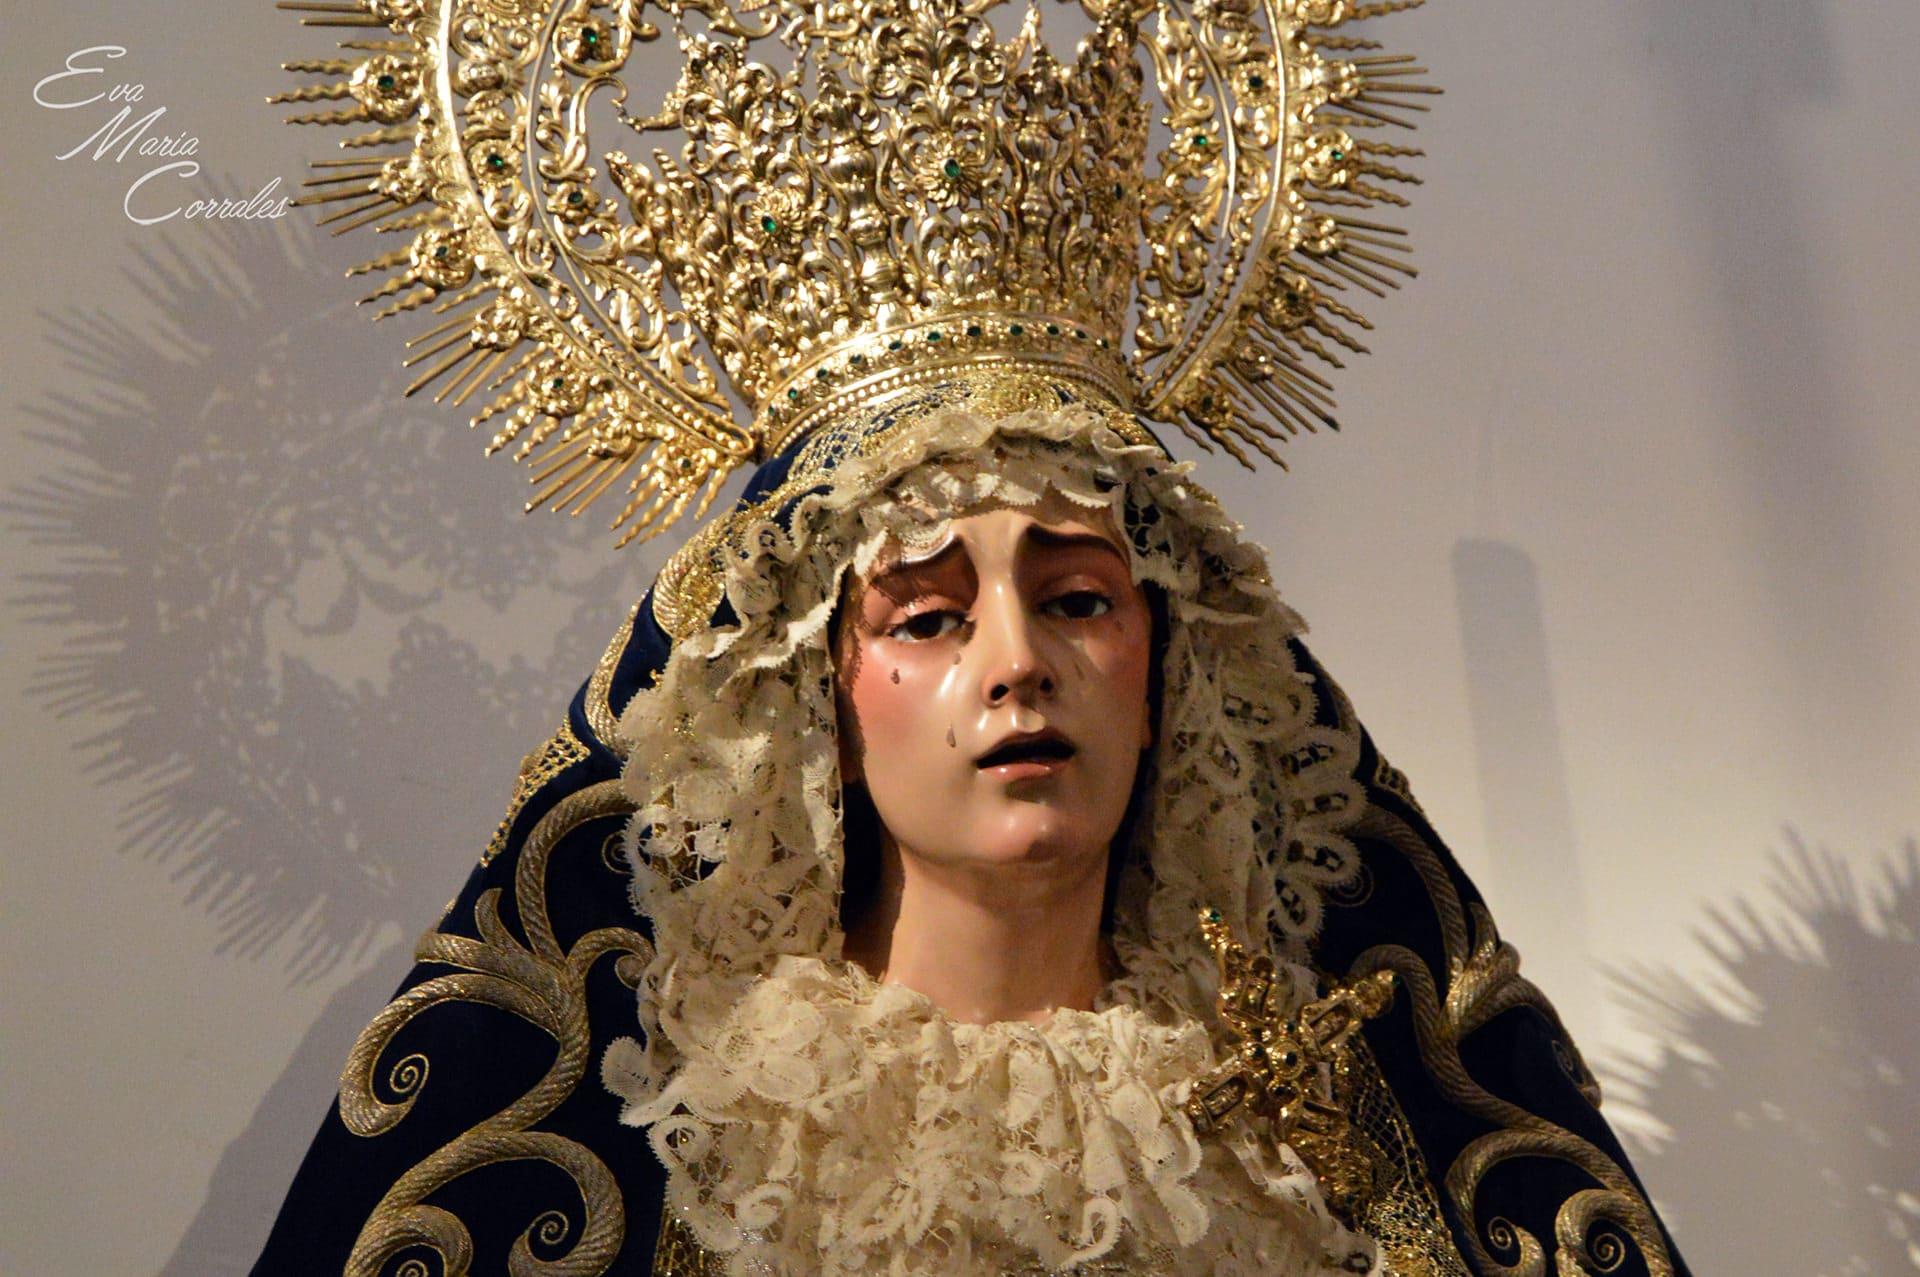 Penas, Málaga 4